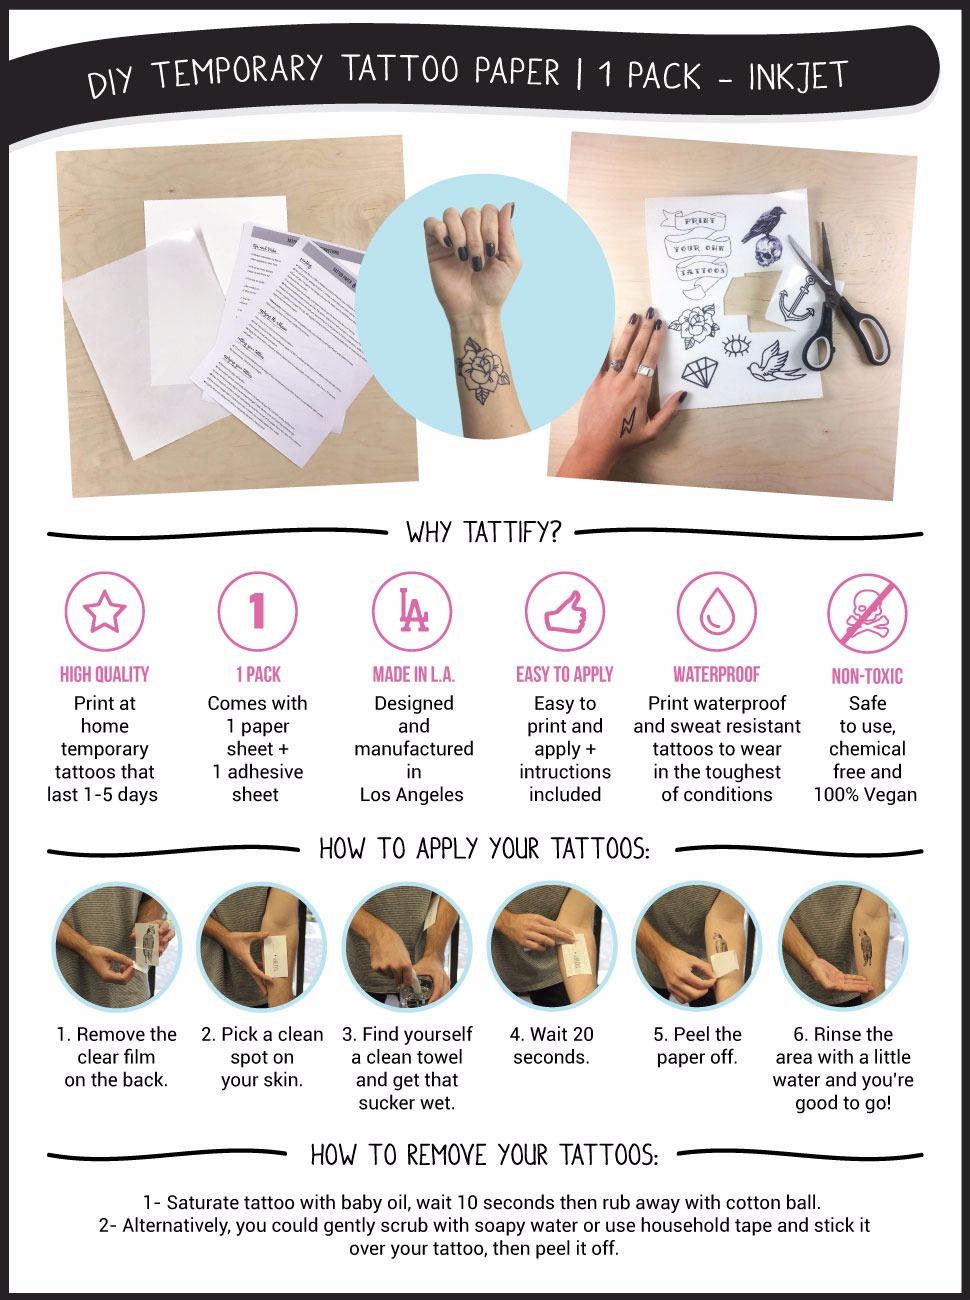 Amazon.com : Tattify DIY Temporary Tattoo Paper 1 Sheet Pack For ...